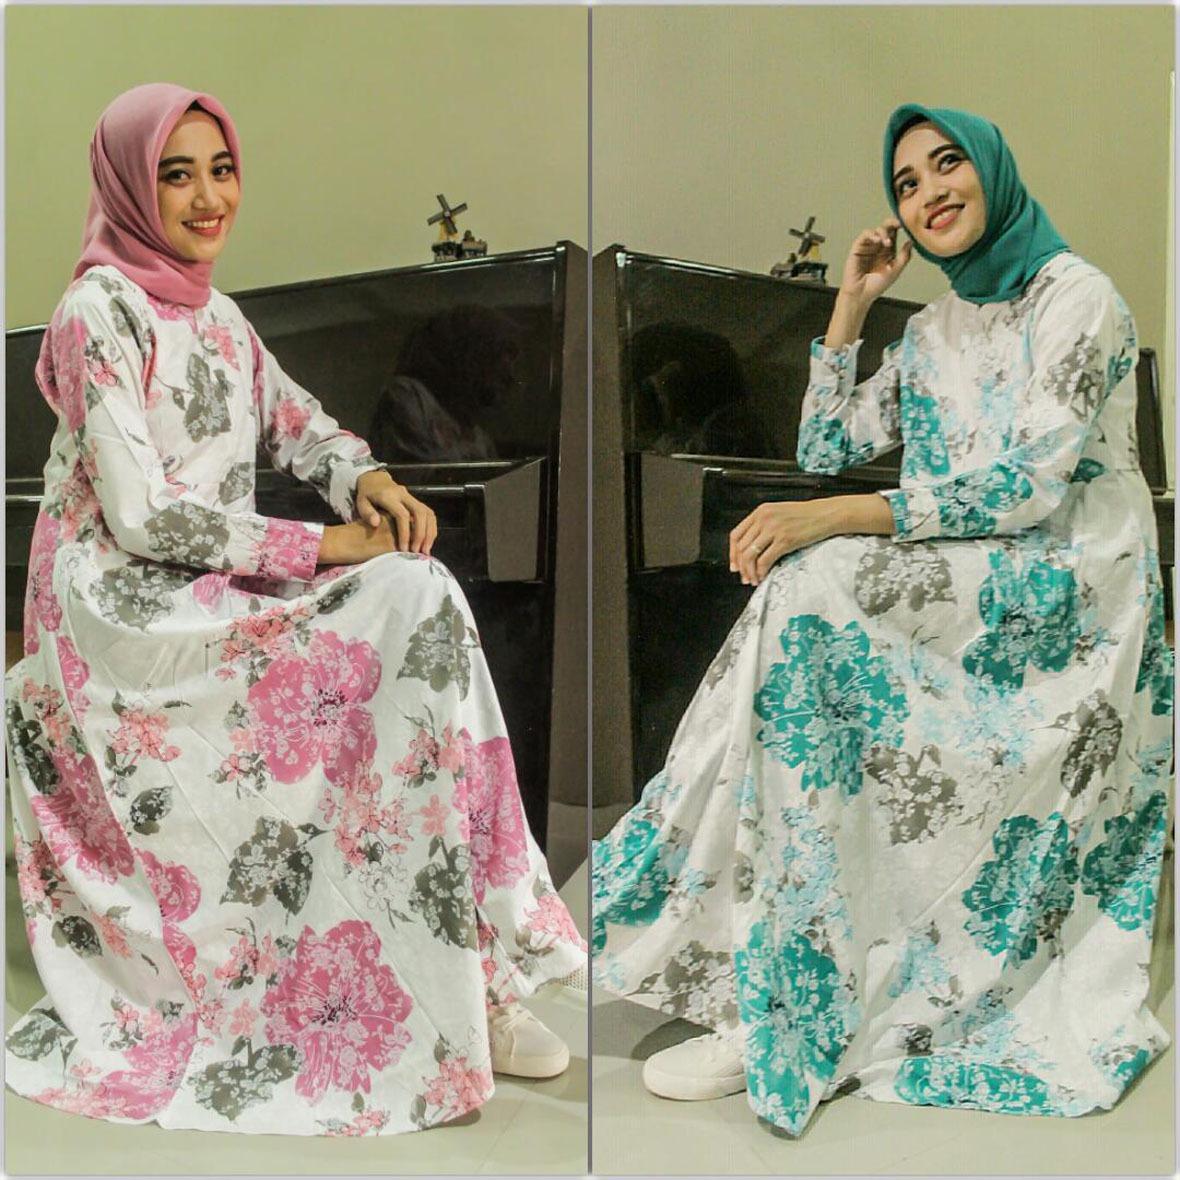 CIPITIHOLIC Baju Gamis Cantik Bahan Katun Motif Gn1686-B - Ada Sleting Depan Cocok Untuk Busui